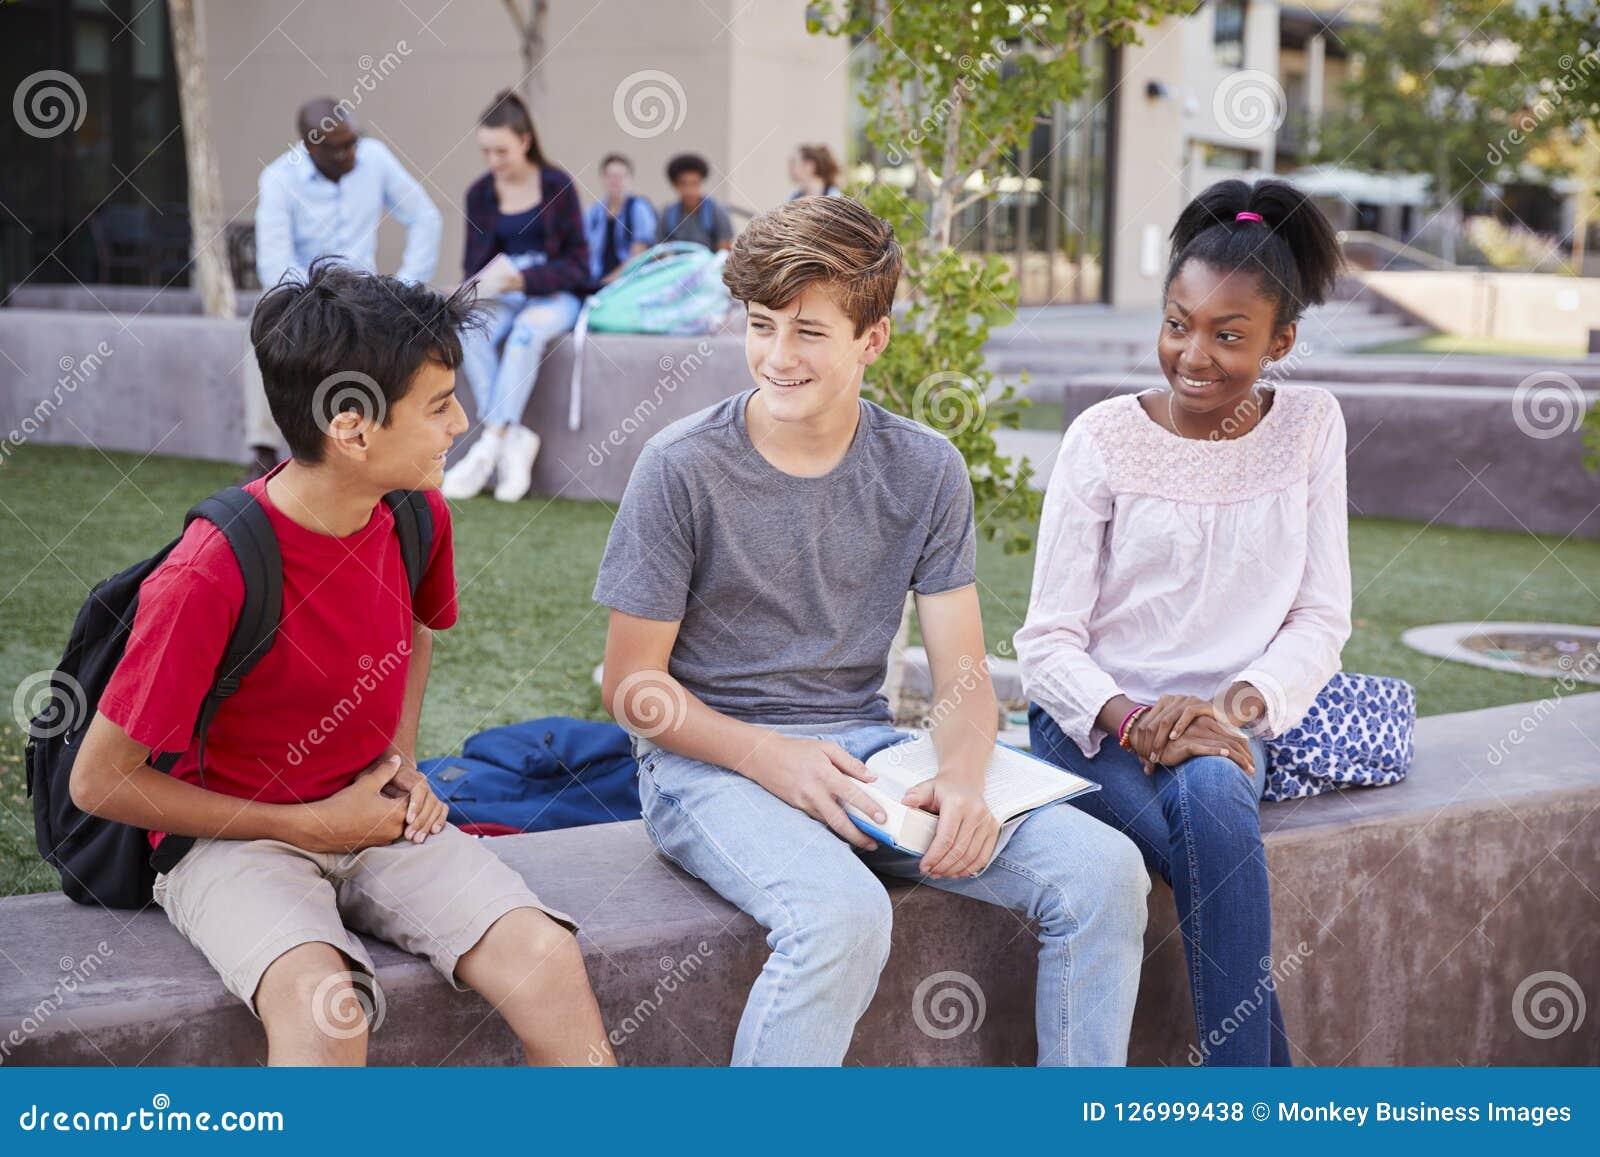 Grupo de estudiantes de la High School secundaria que estudian al aire libre durante hendidura